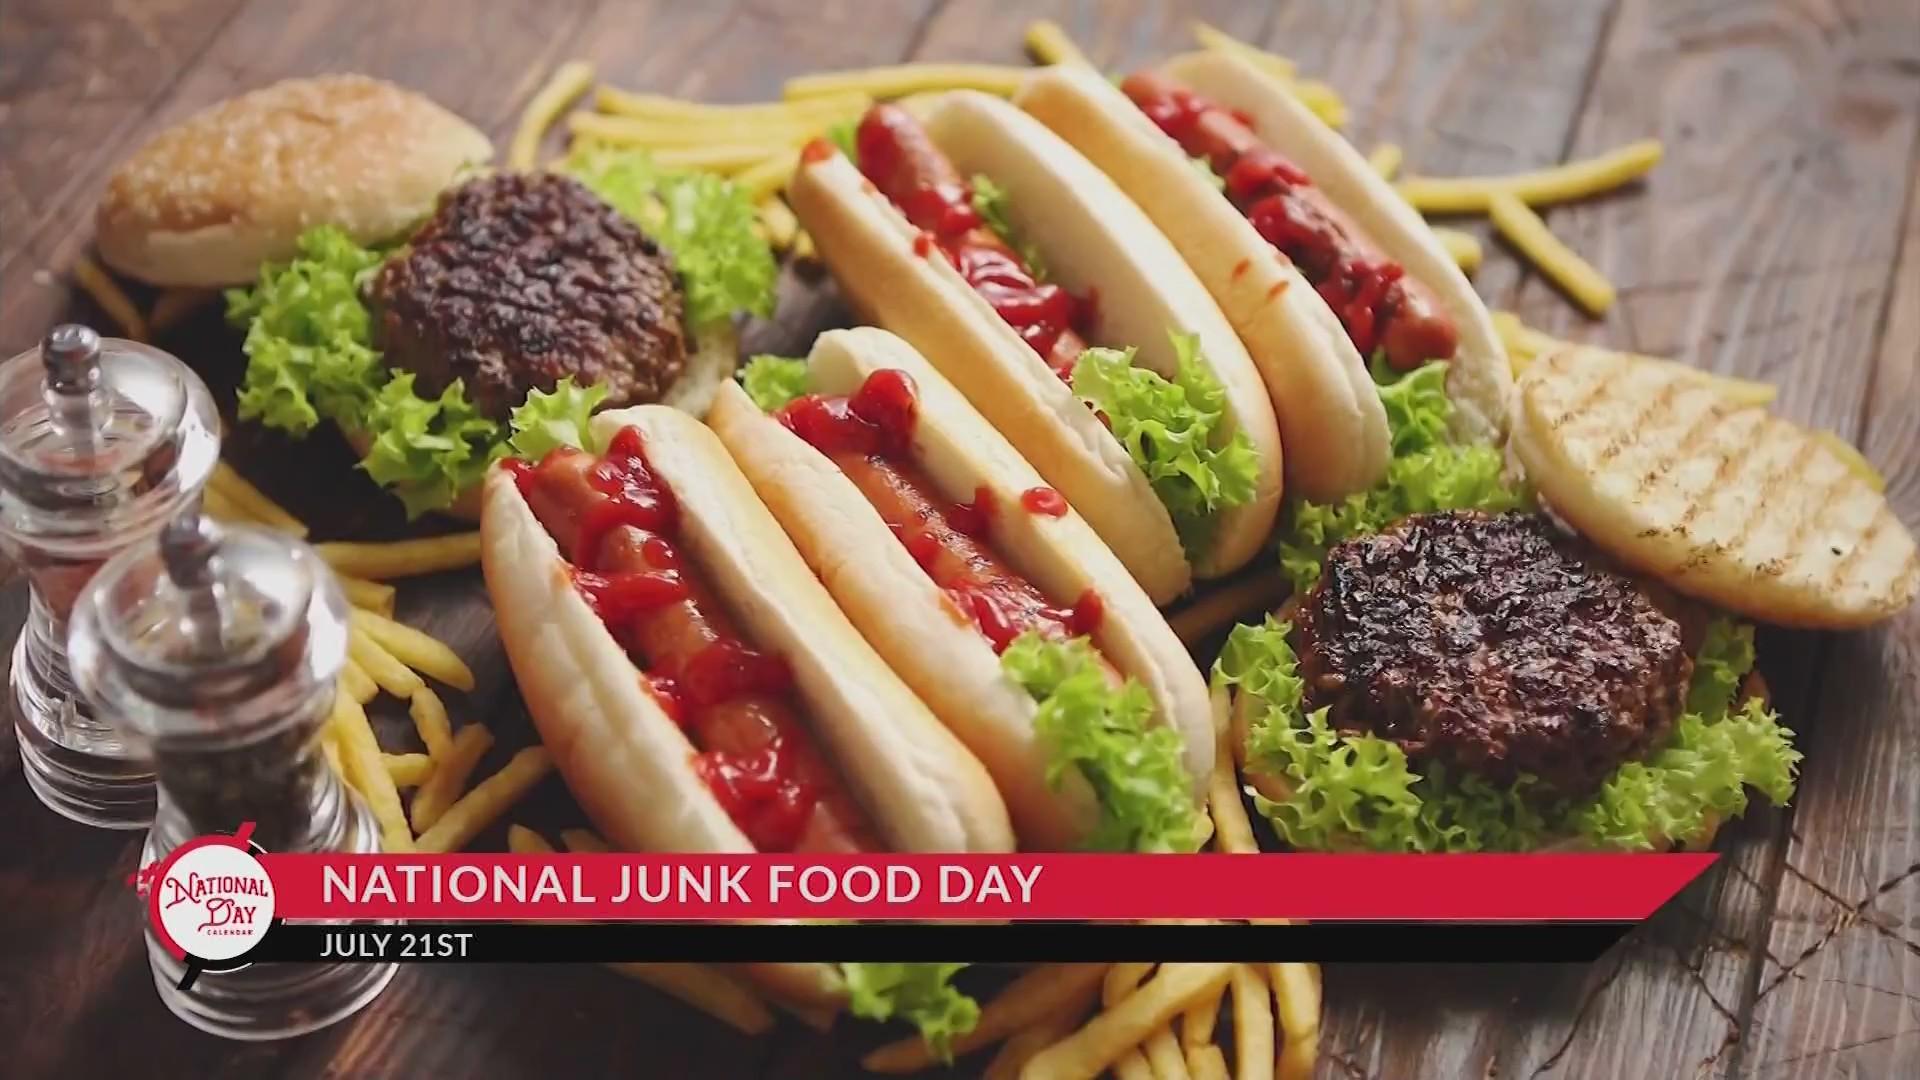 NATIONAL DAY CALENDAR National Junk Food Day KX NEWS 1920x1080